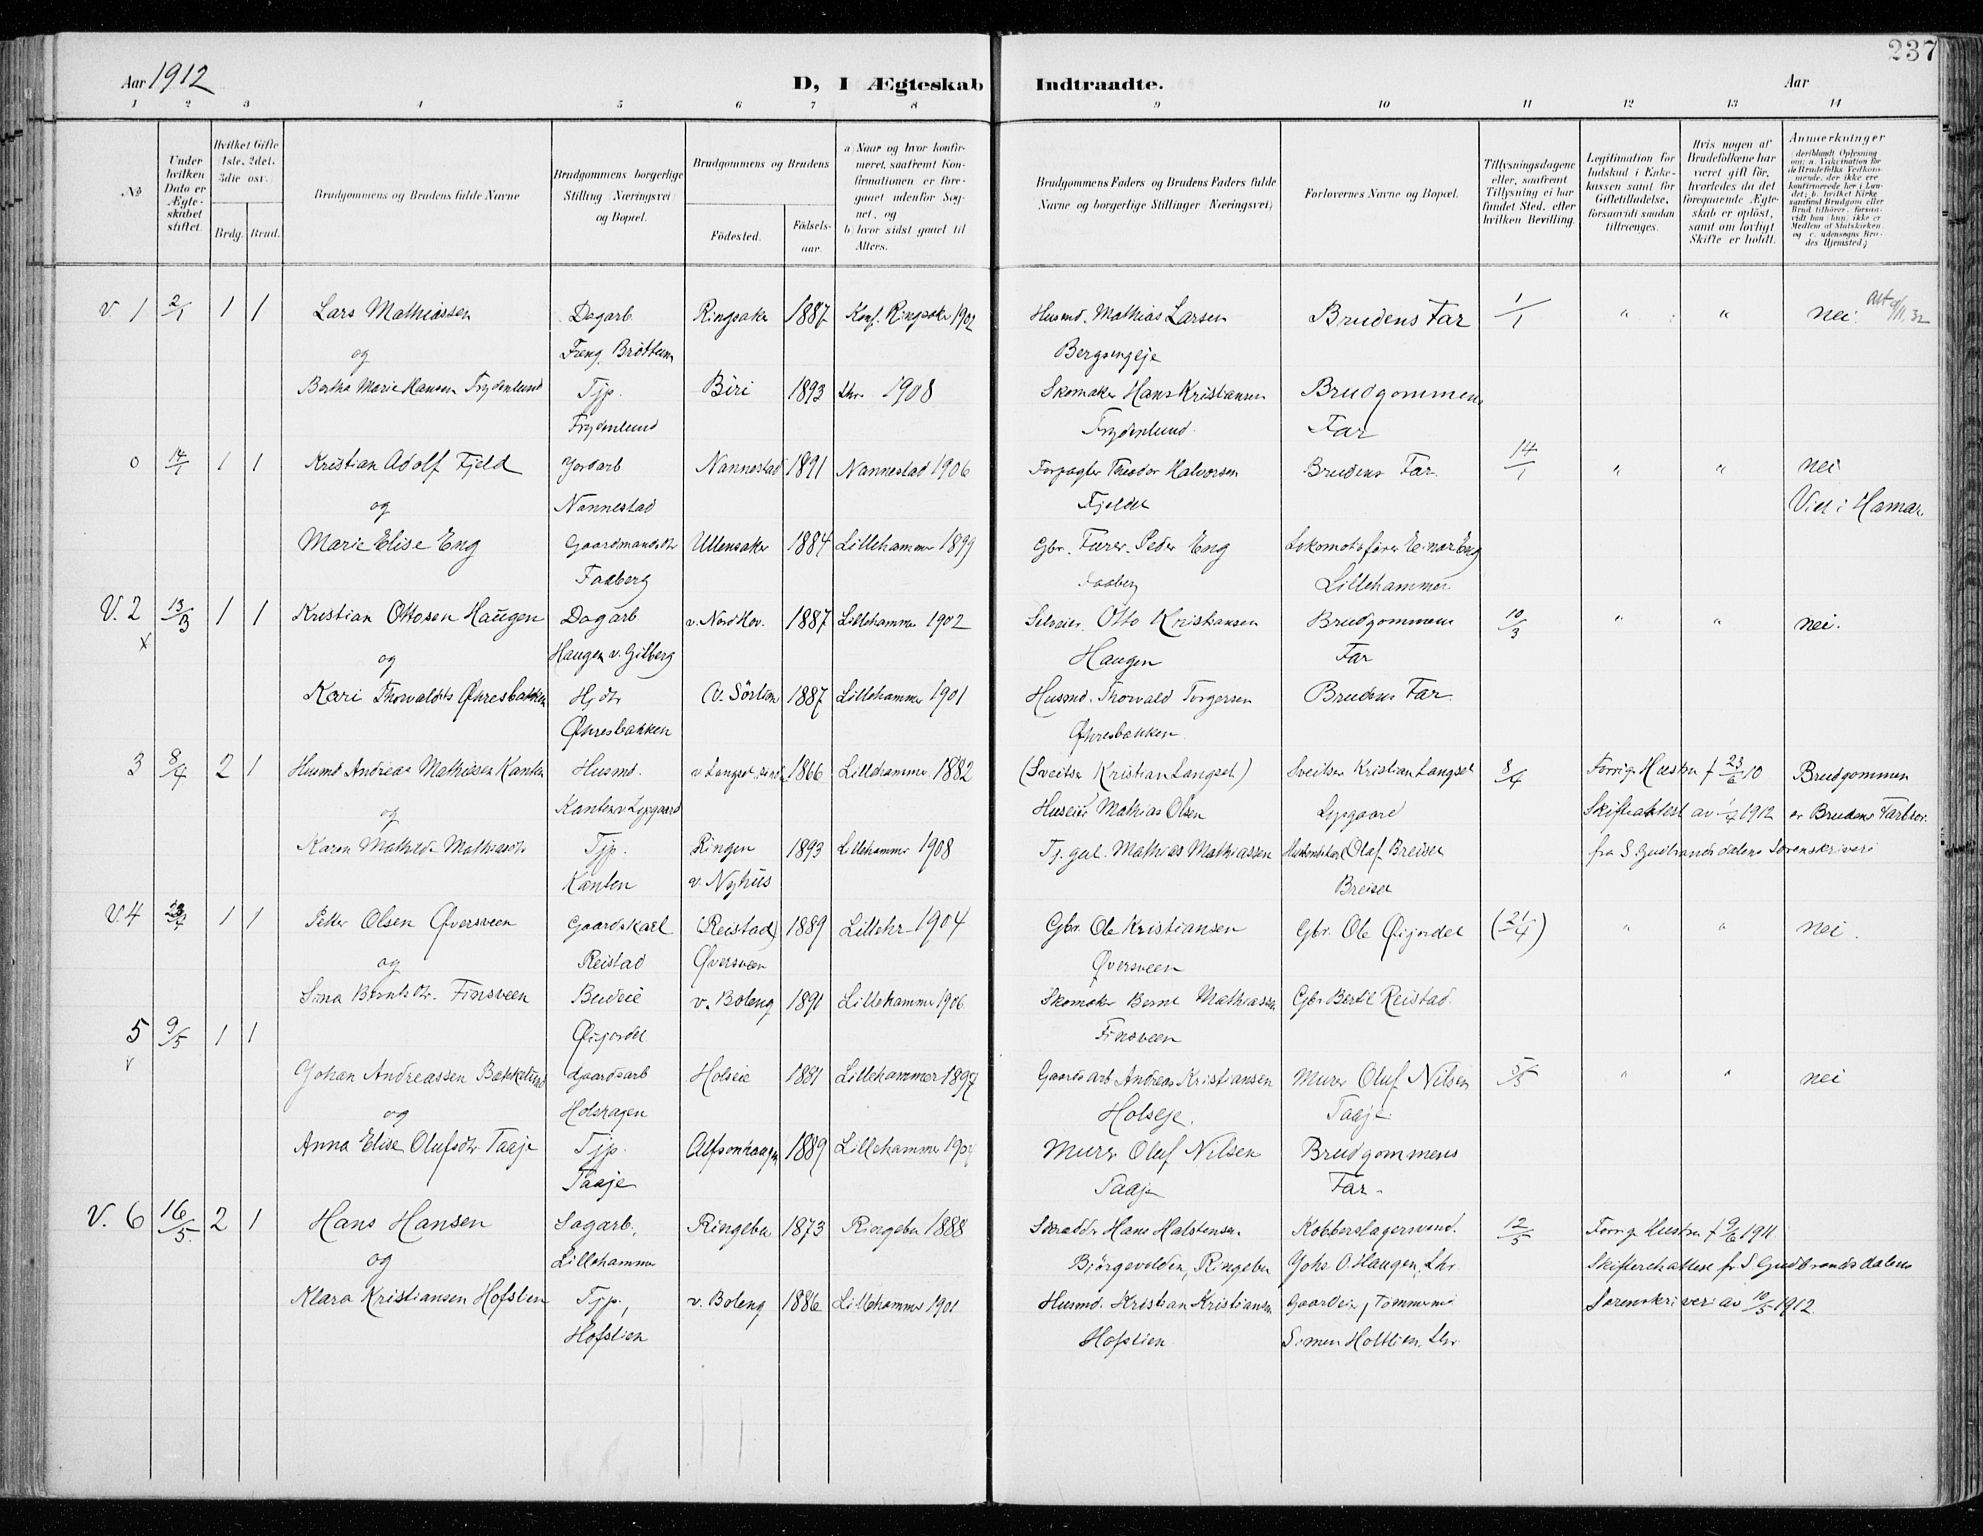 SAH, Fåberg prestekontor, Ministerialbok nr. 11, 1899-1913, s. 237